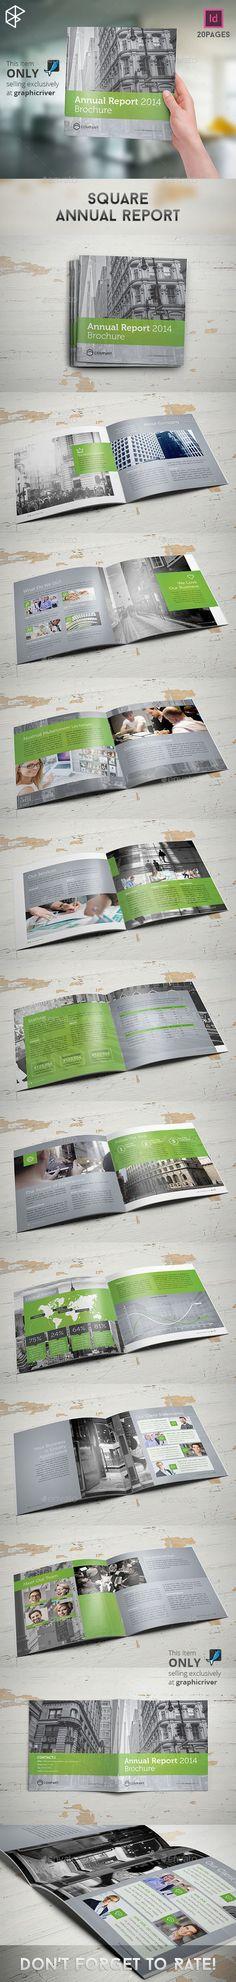 Square Annual Report Brochure Template #design Download: http://graphicriver.net/item/square-annual-report/10280698?ref=ksioks